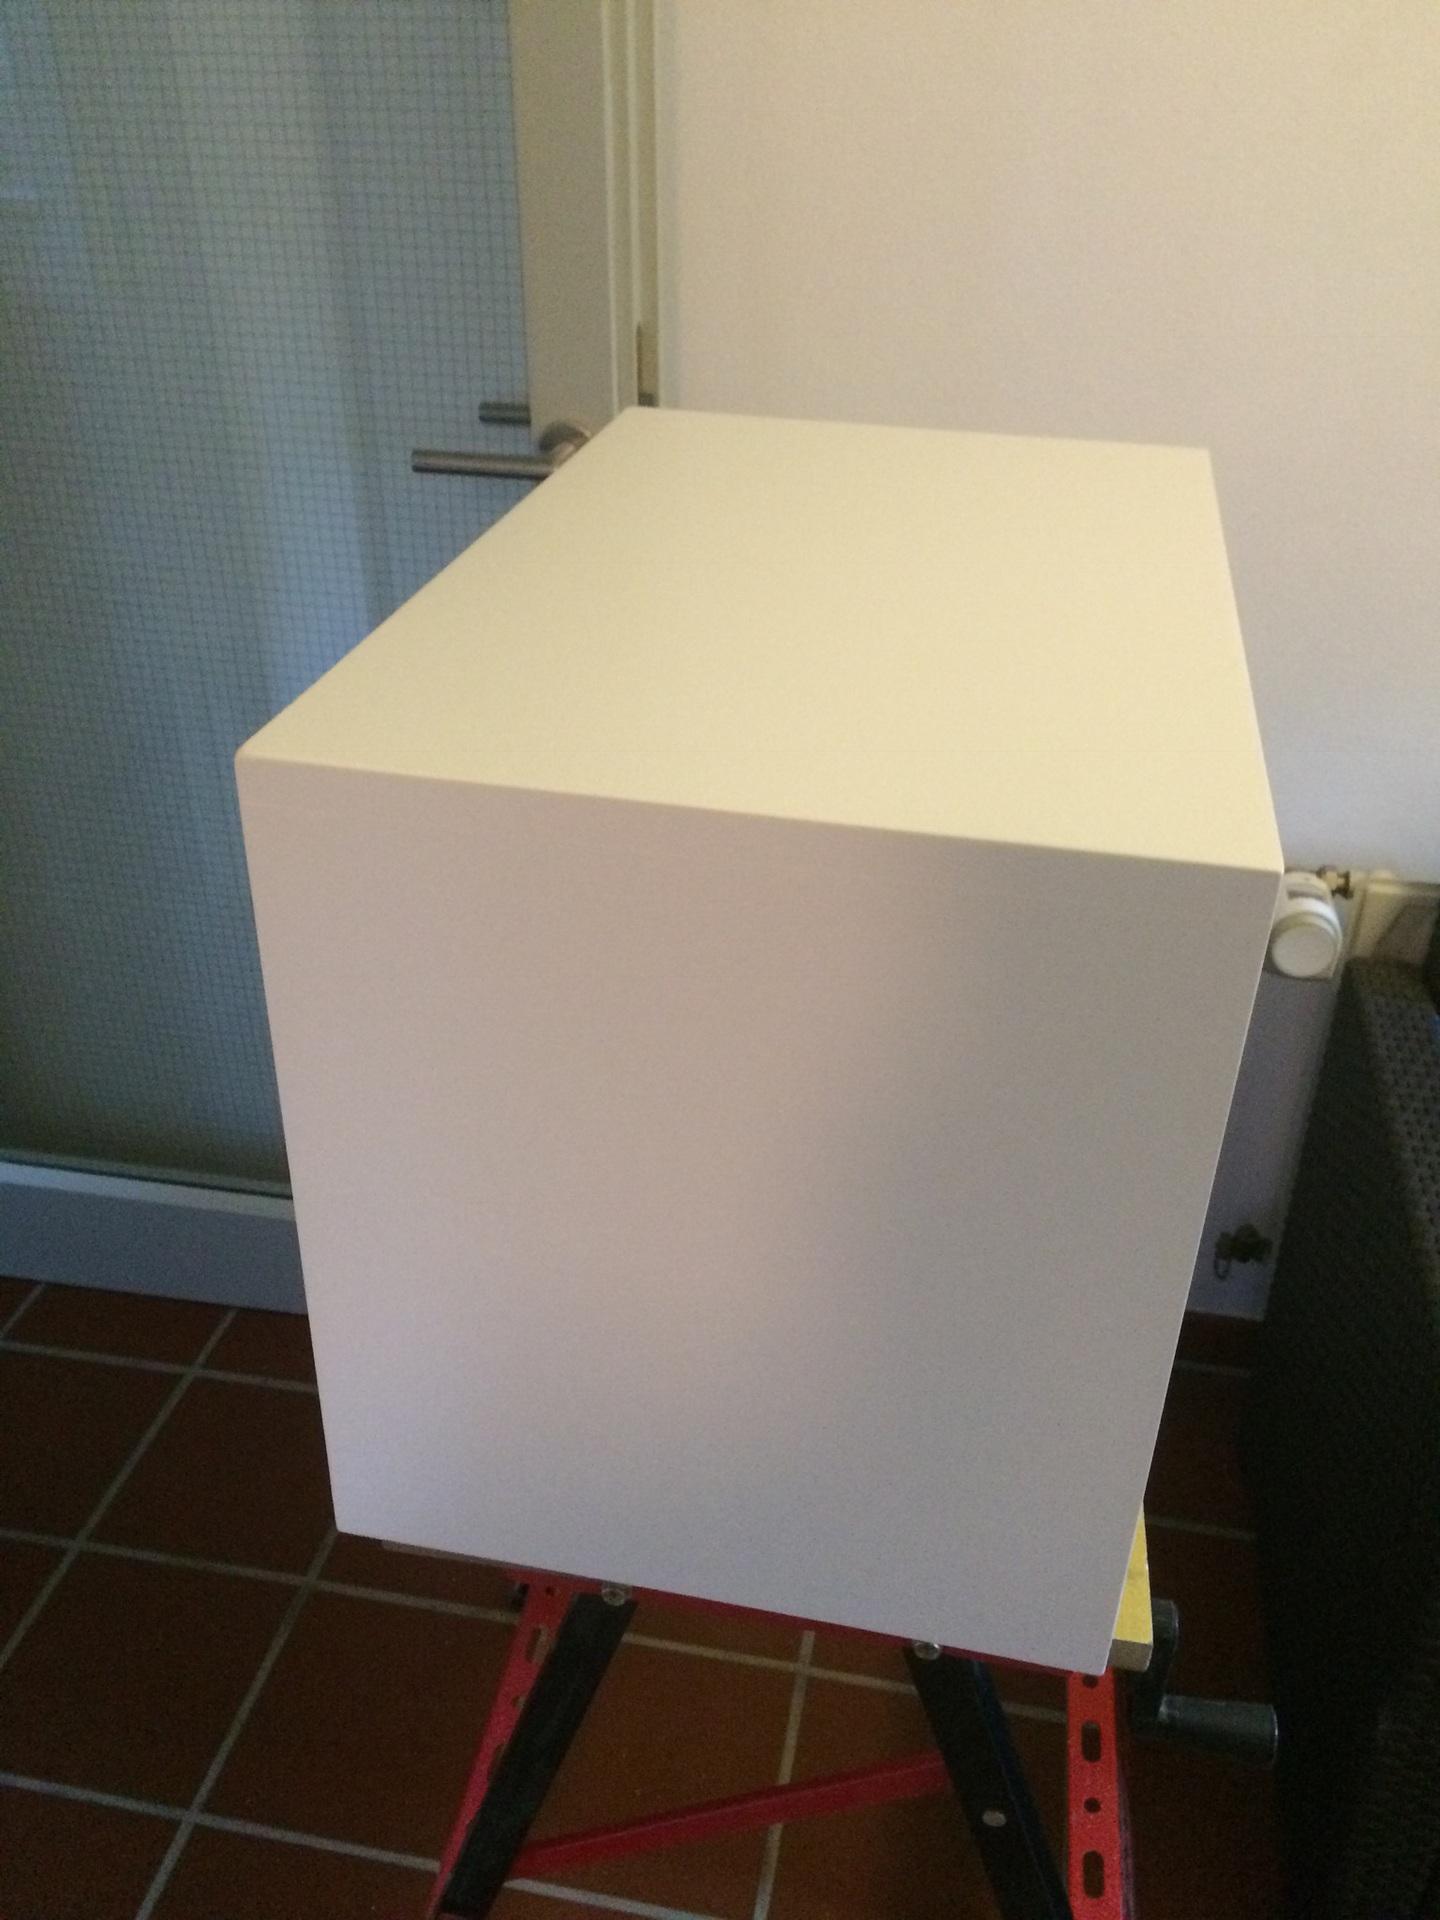 img 0095 hifi bildergalerie. Black Bedroom Furniture Sets. Home Design Ideas